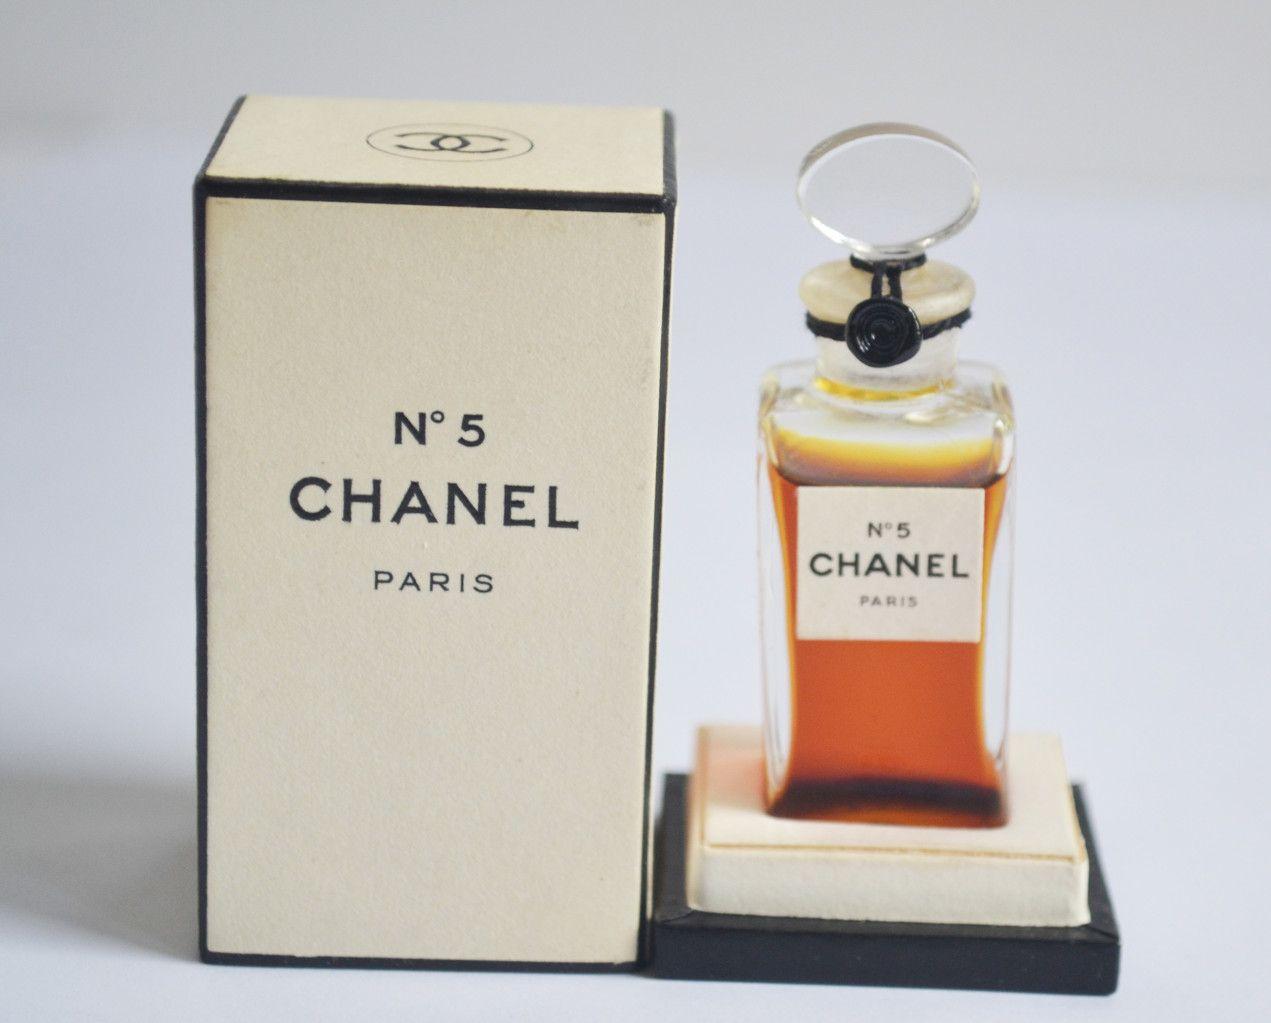 Chanel No 5 Perfume Extrait No 201 In 2019 Vintage Perfumes